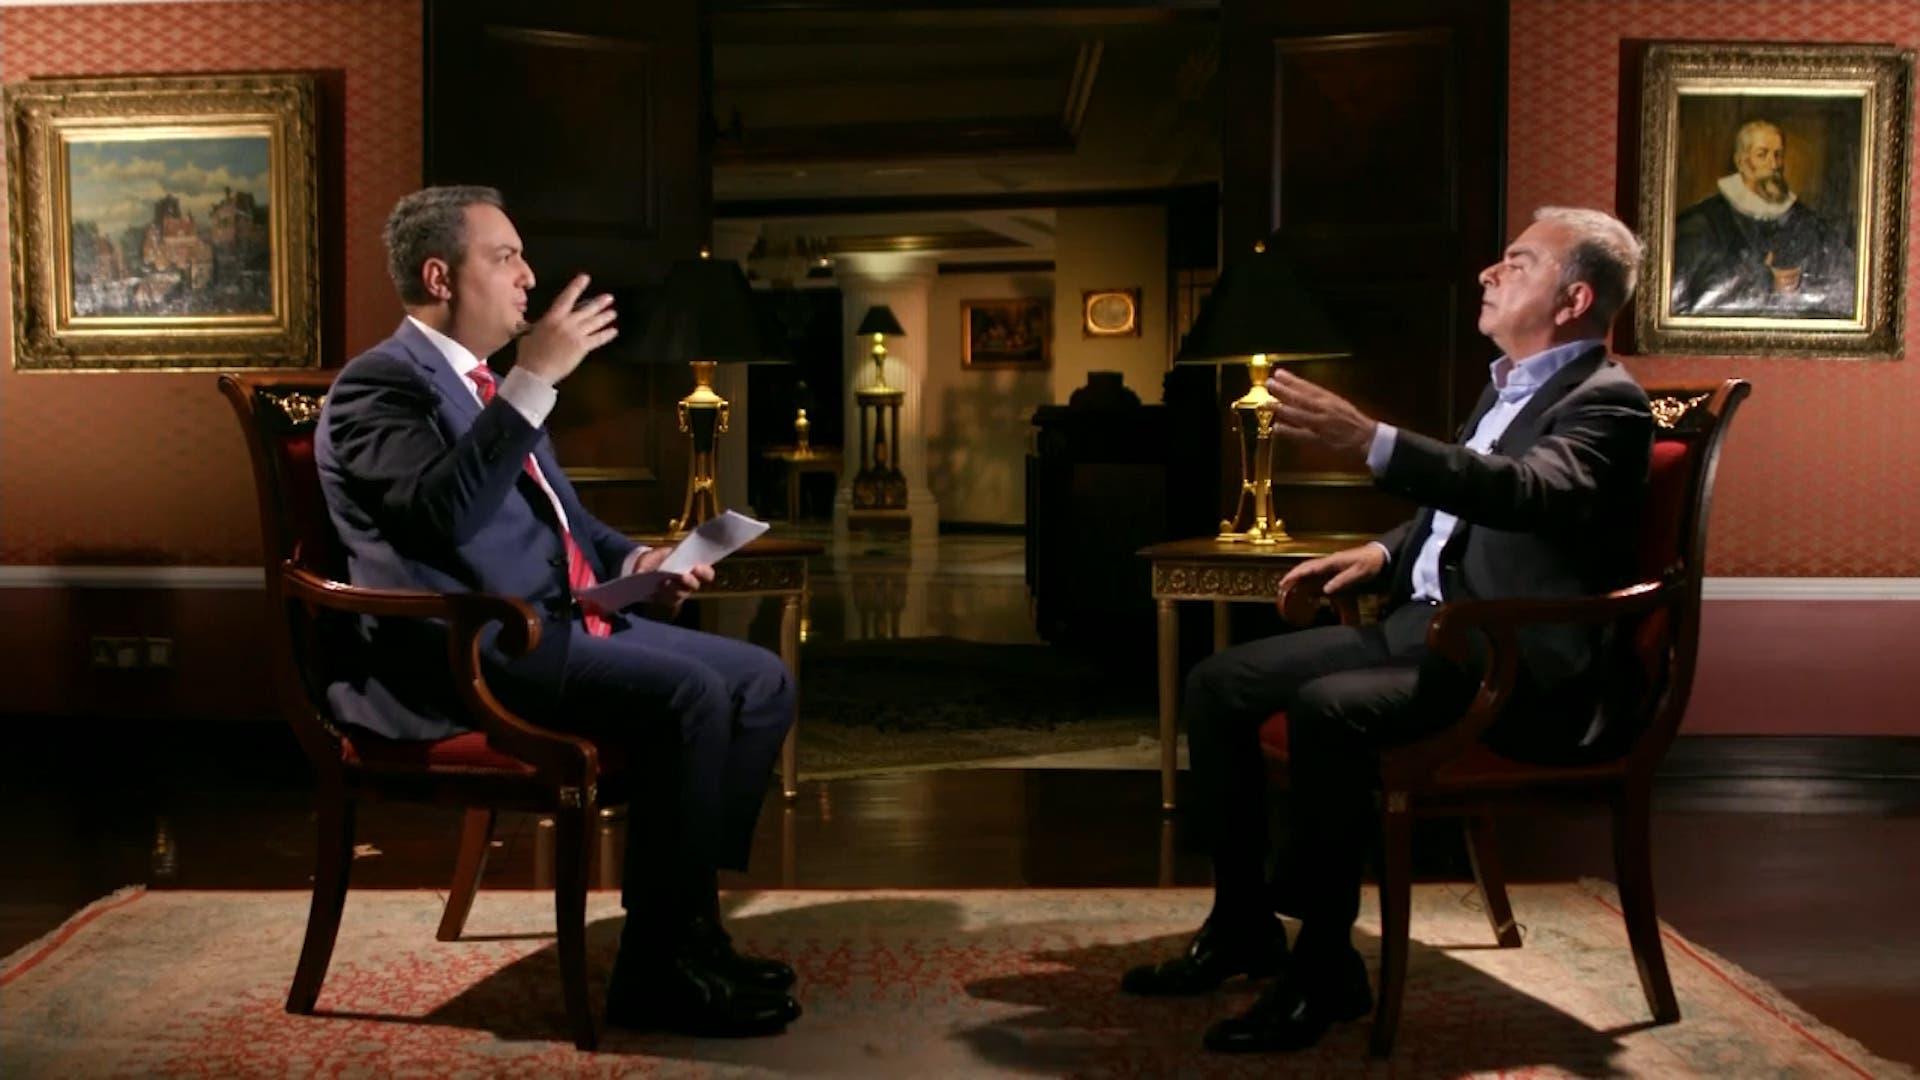 Former Nissan boss Carlos Ghosn in an exclusive interview with Al Alrabiya. (Al Arabiya)